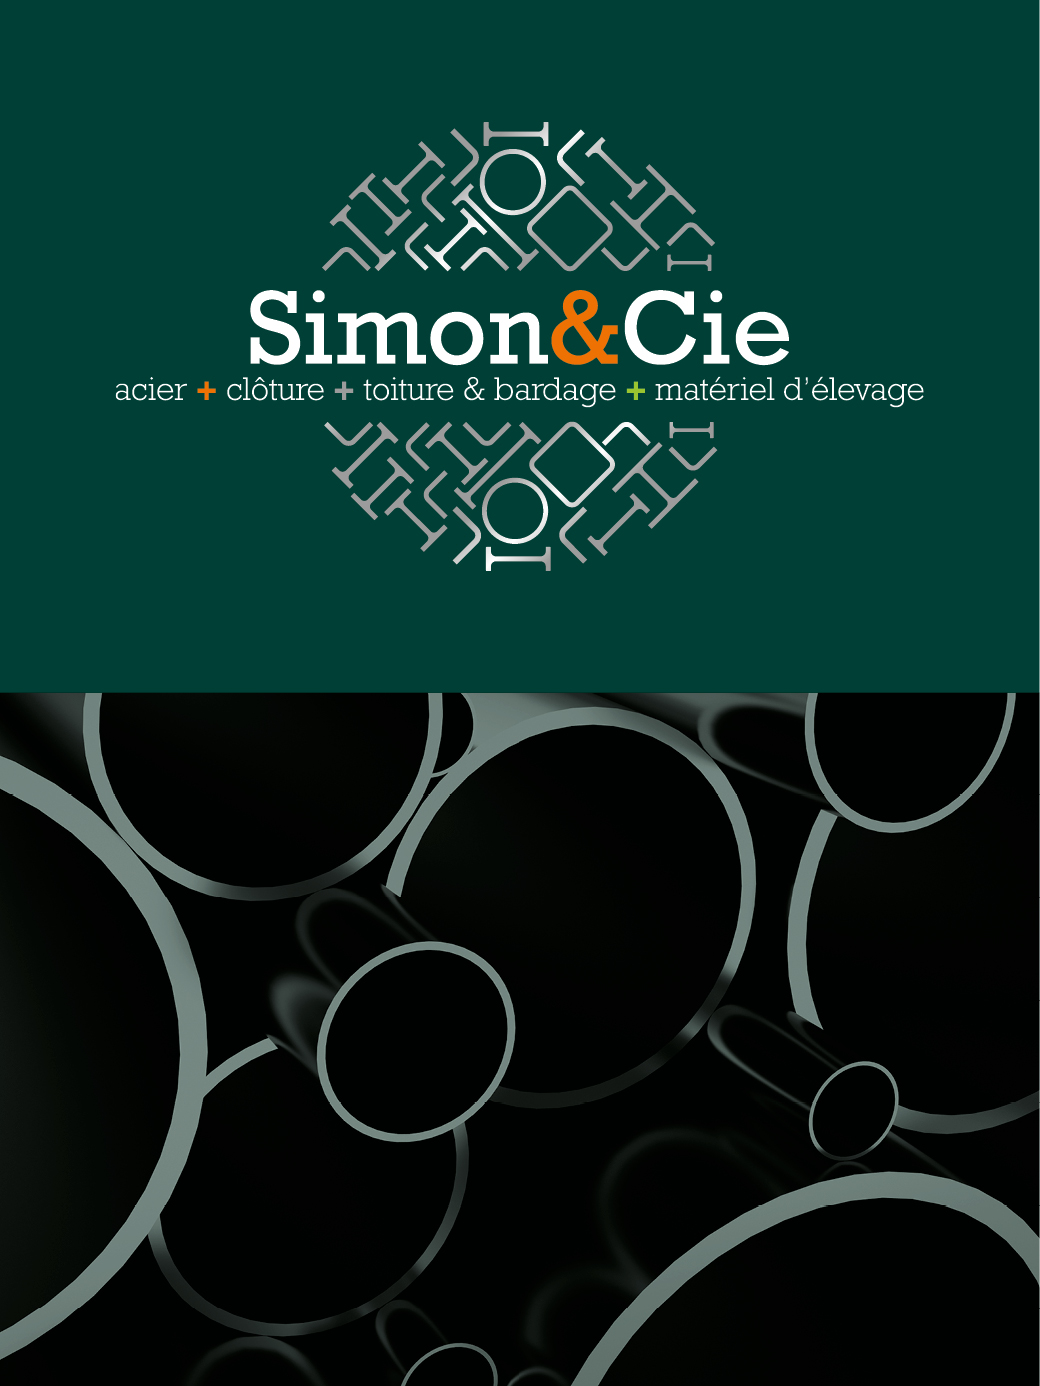 Simon&Cie